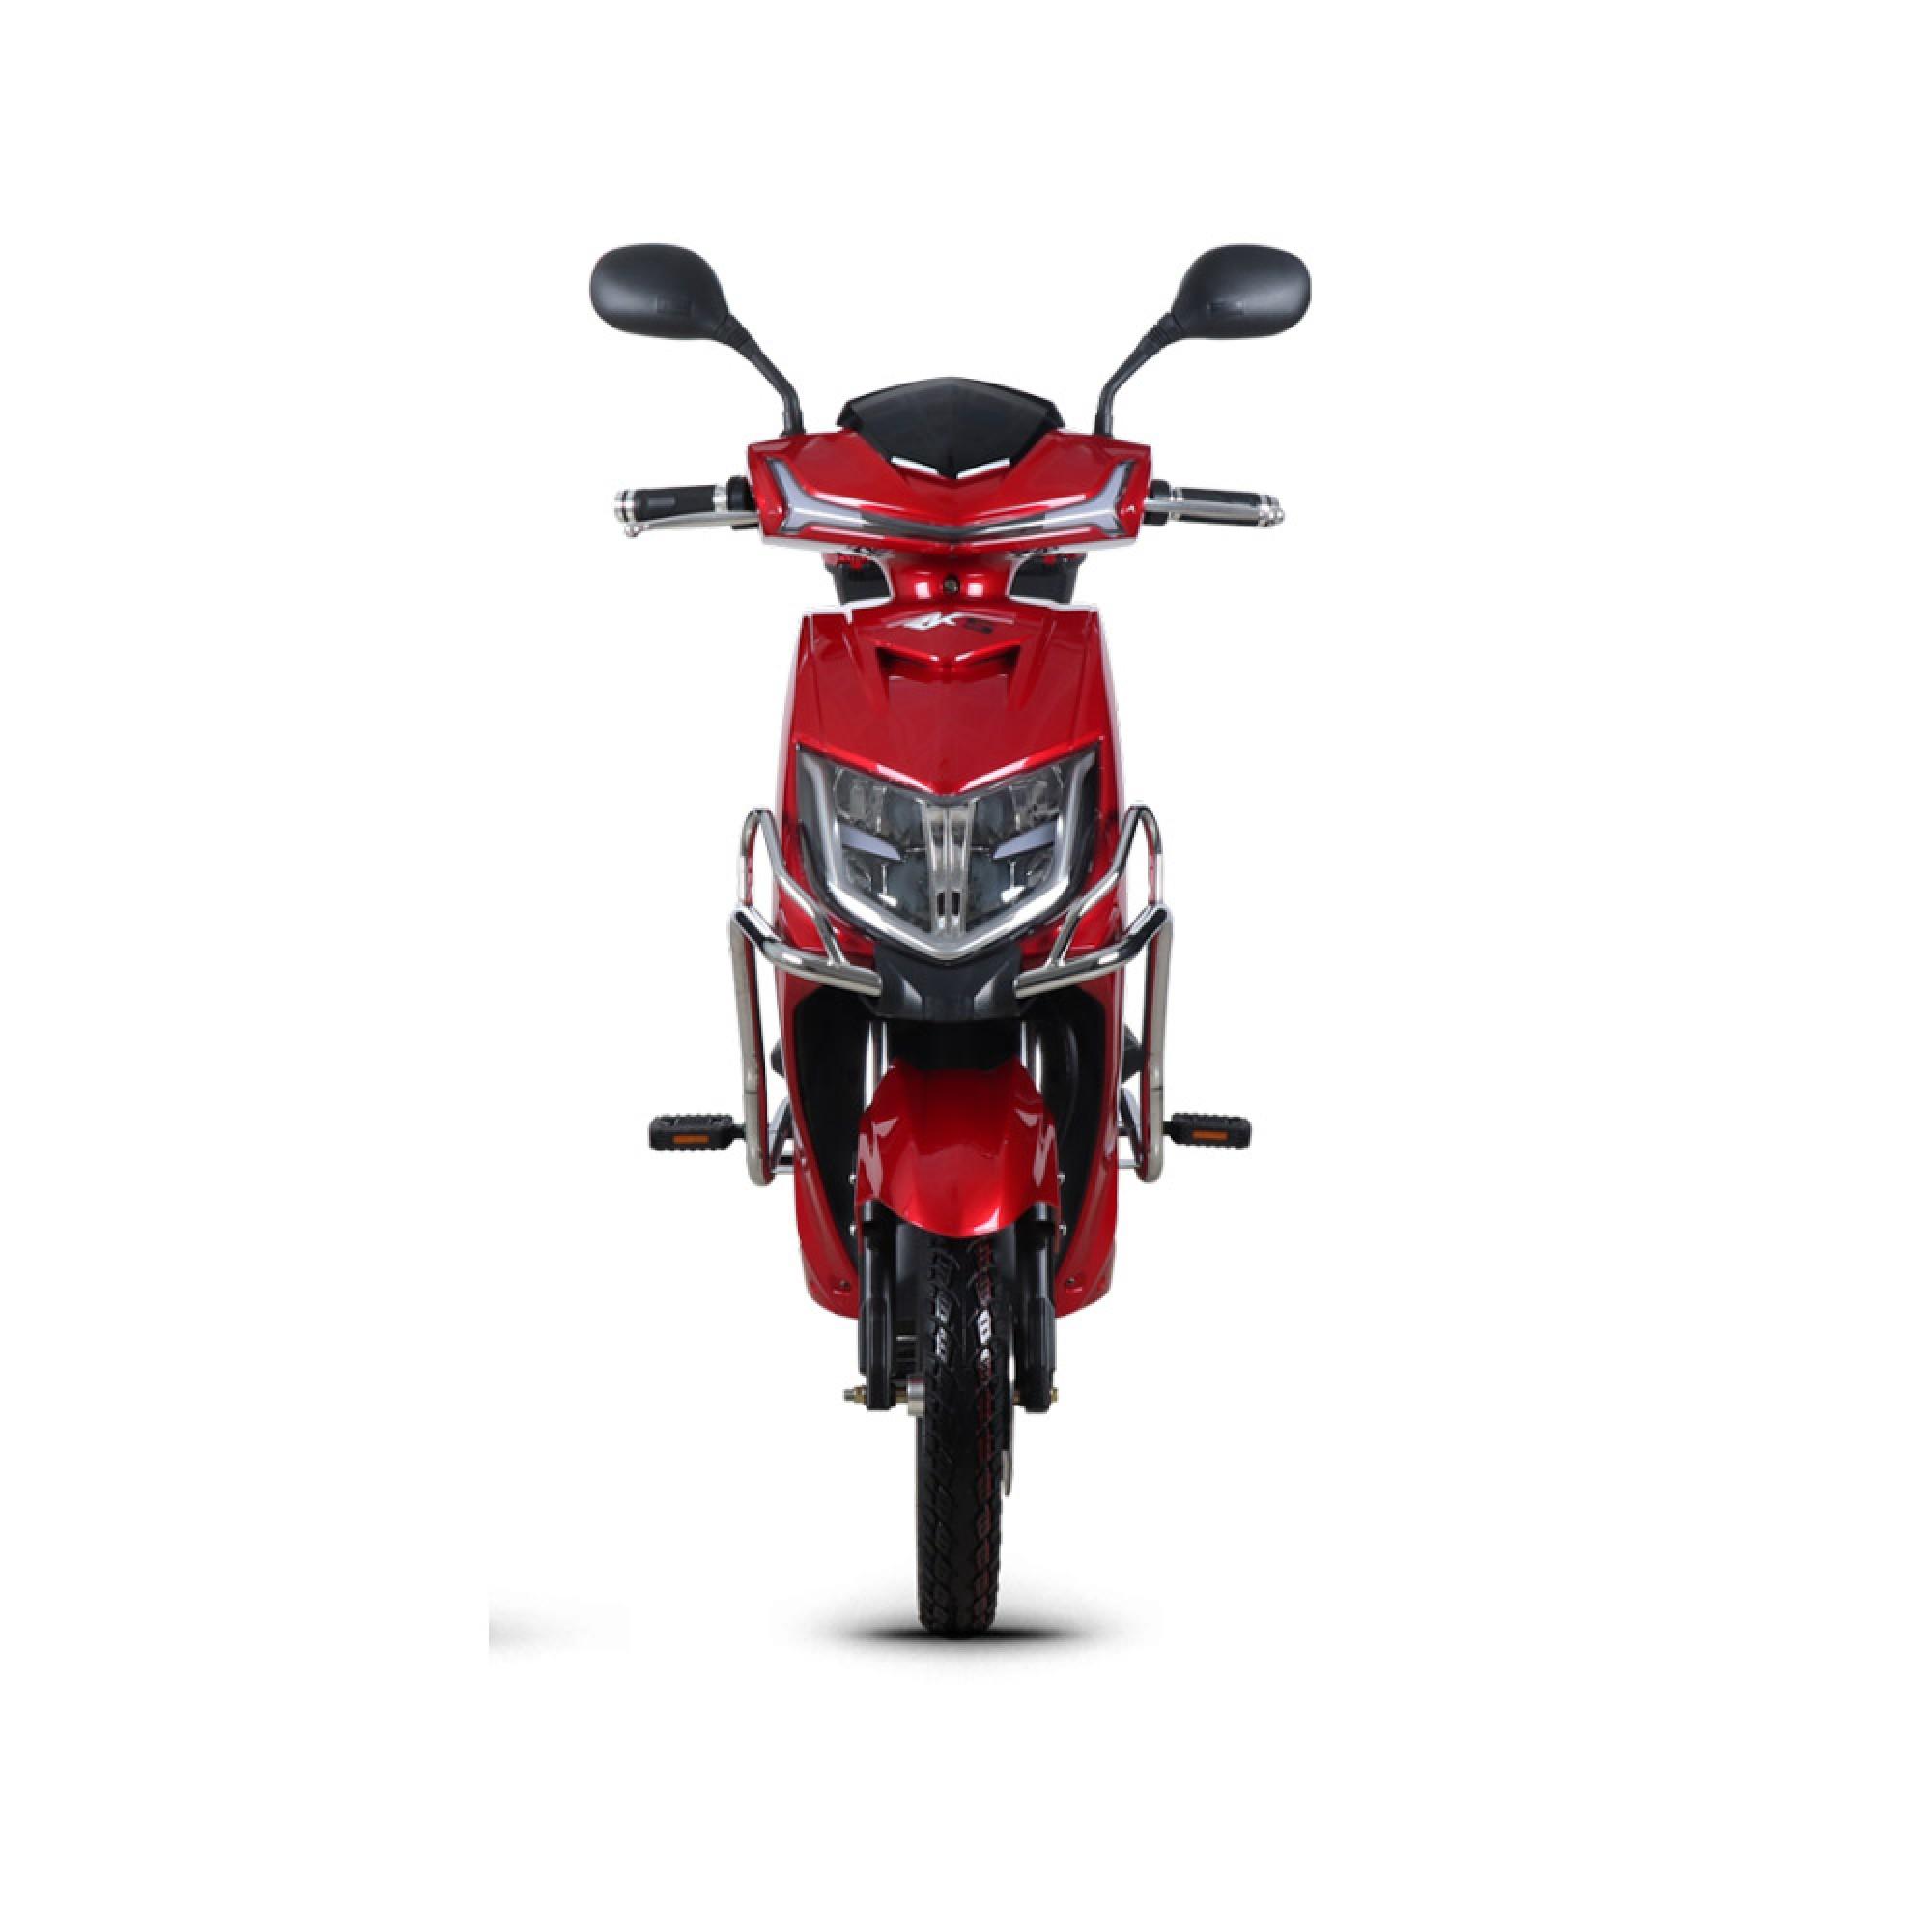 Eco Rider Mx Rks